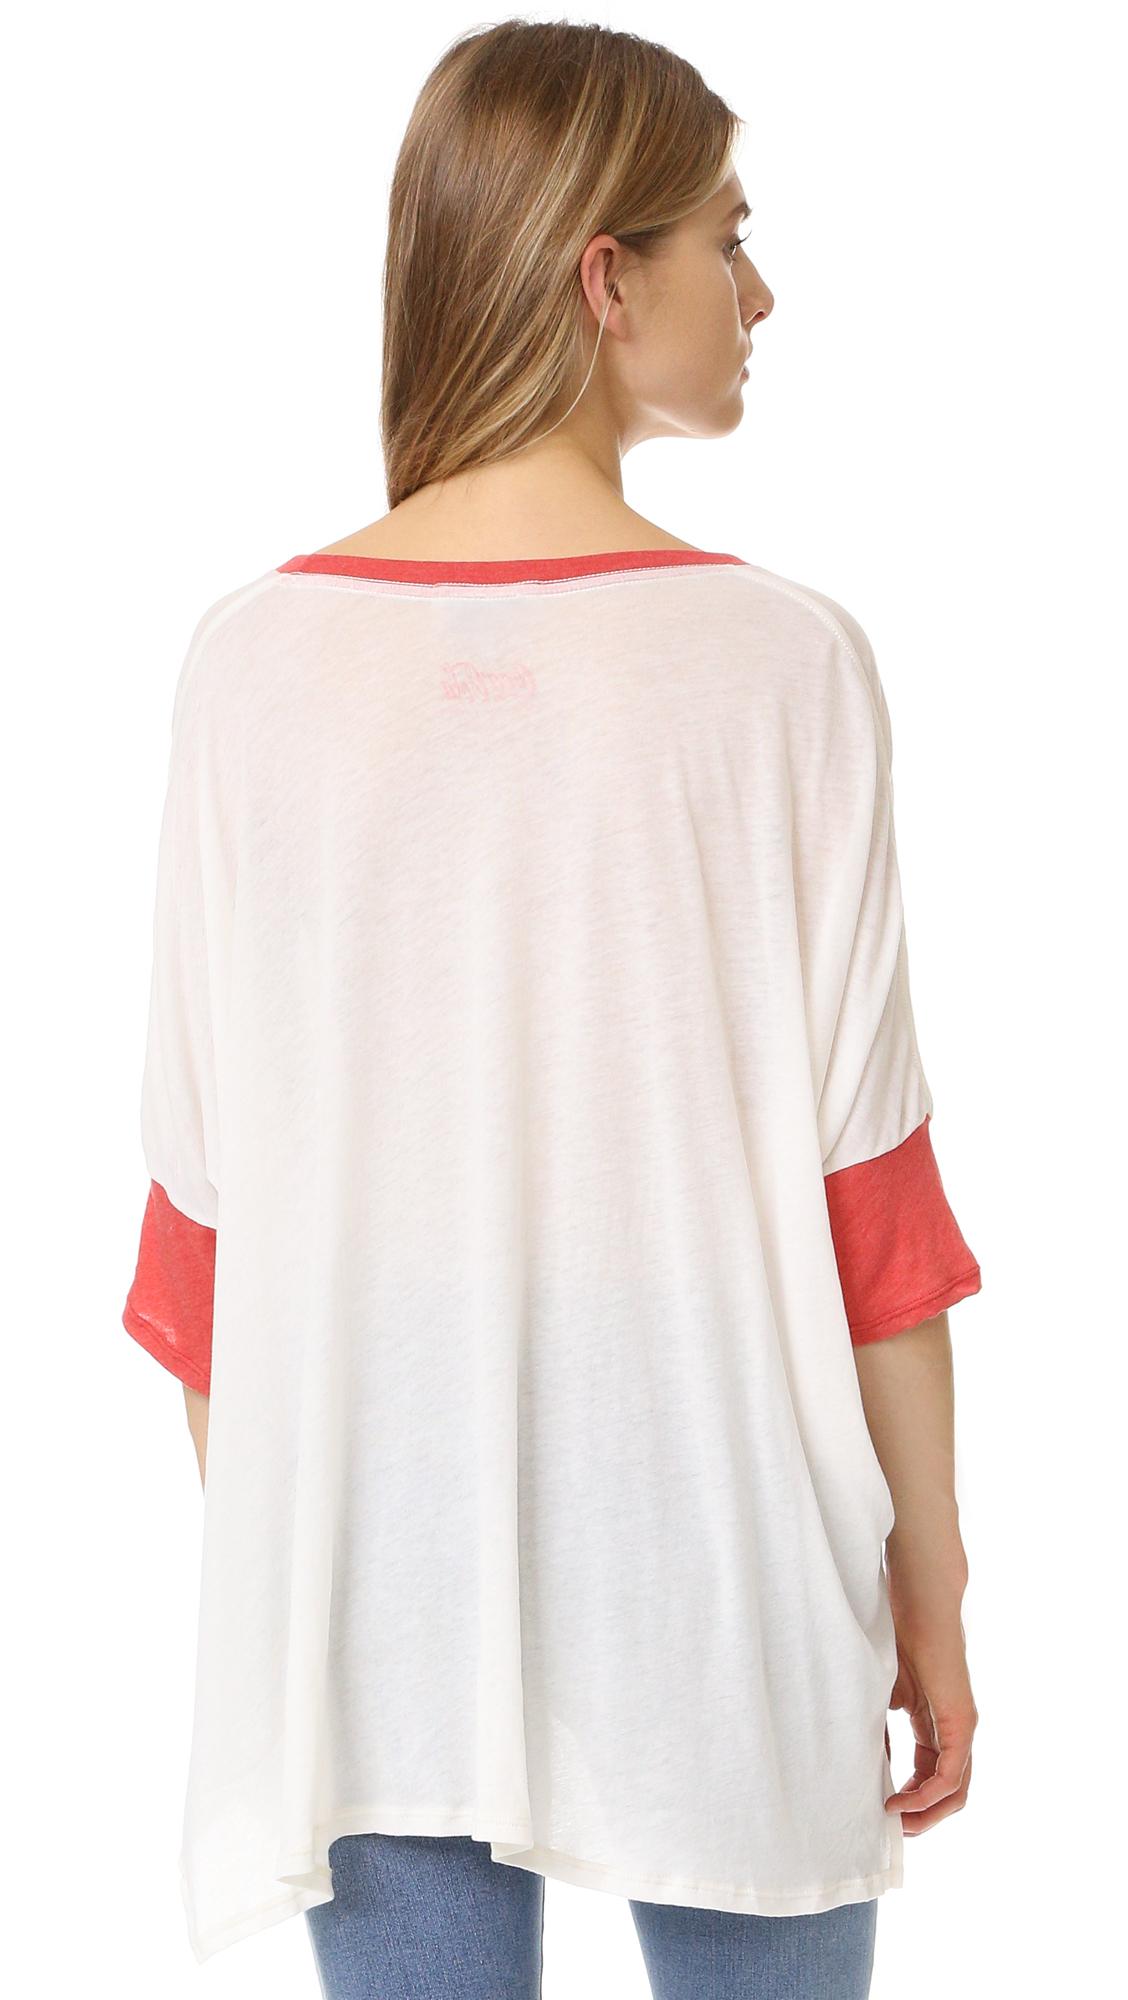 b6d51c40dd6 Wildfox Coca Cola Morning T-shirt | SHOPBOP